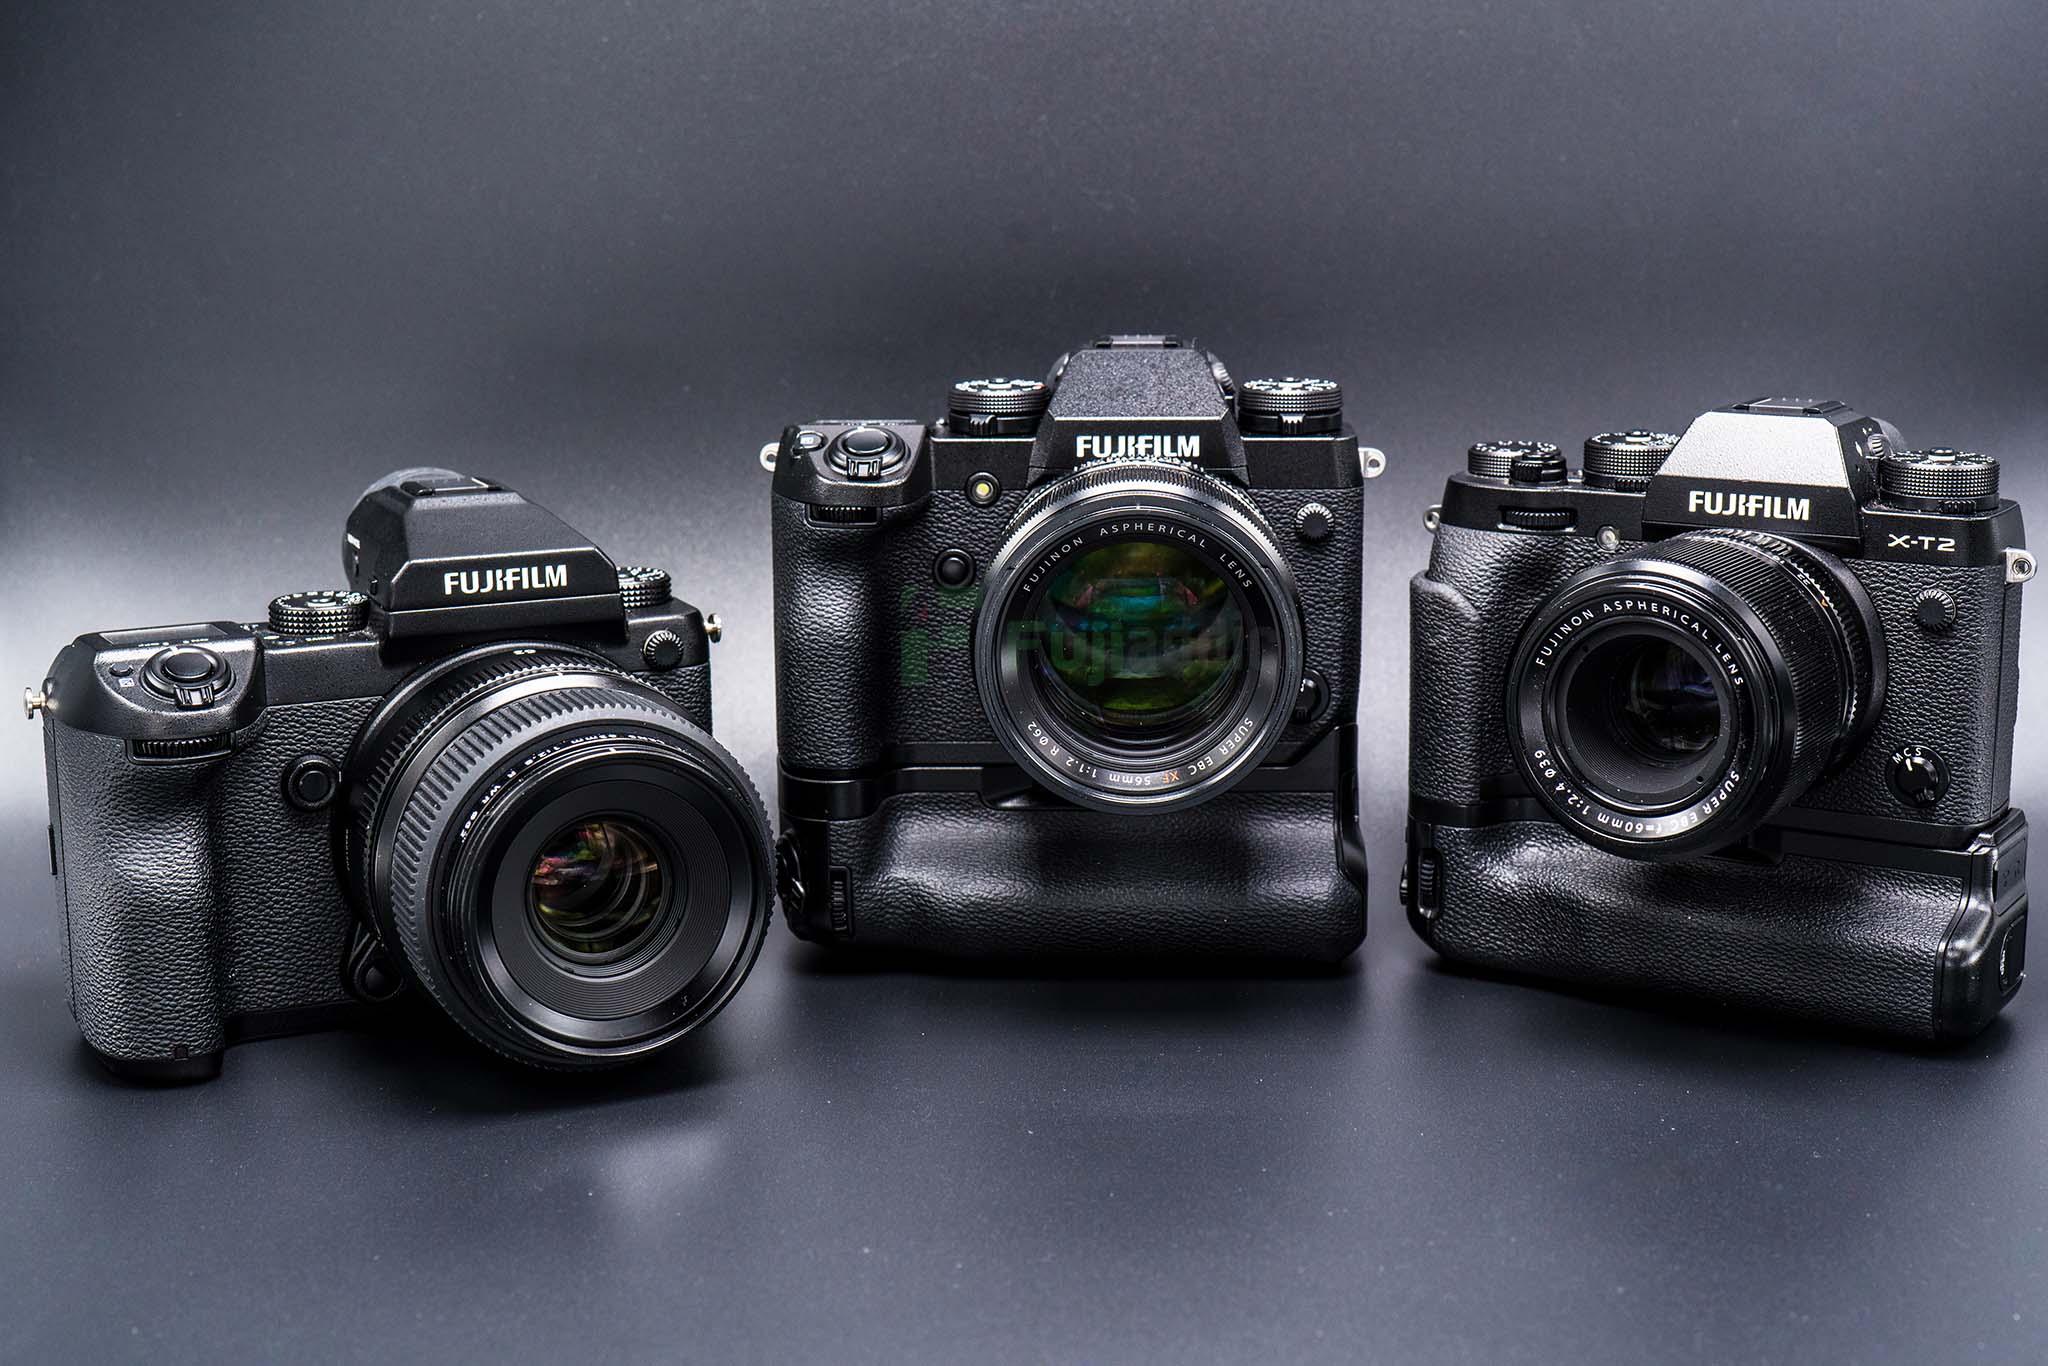 Fujifilm XH-1: My First Impressions and Comparison Photos - Fuji Addict